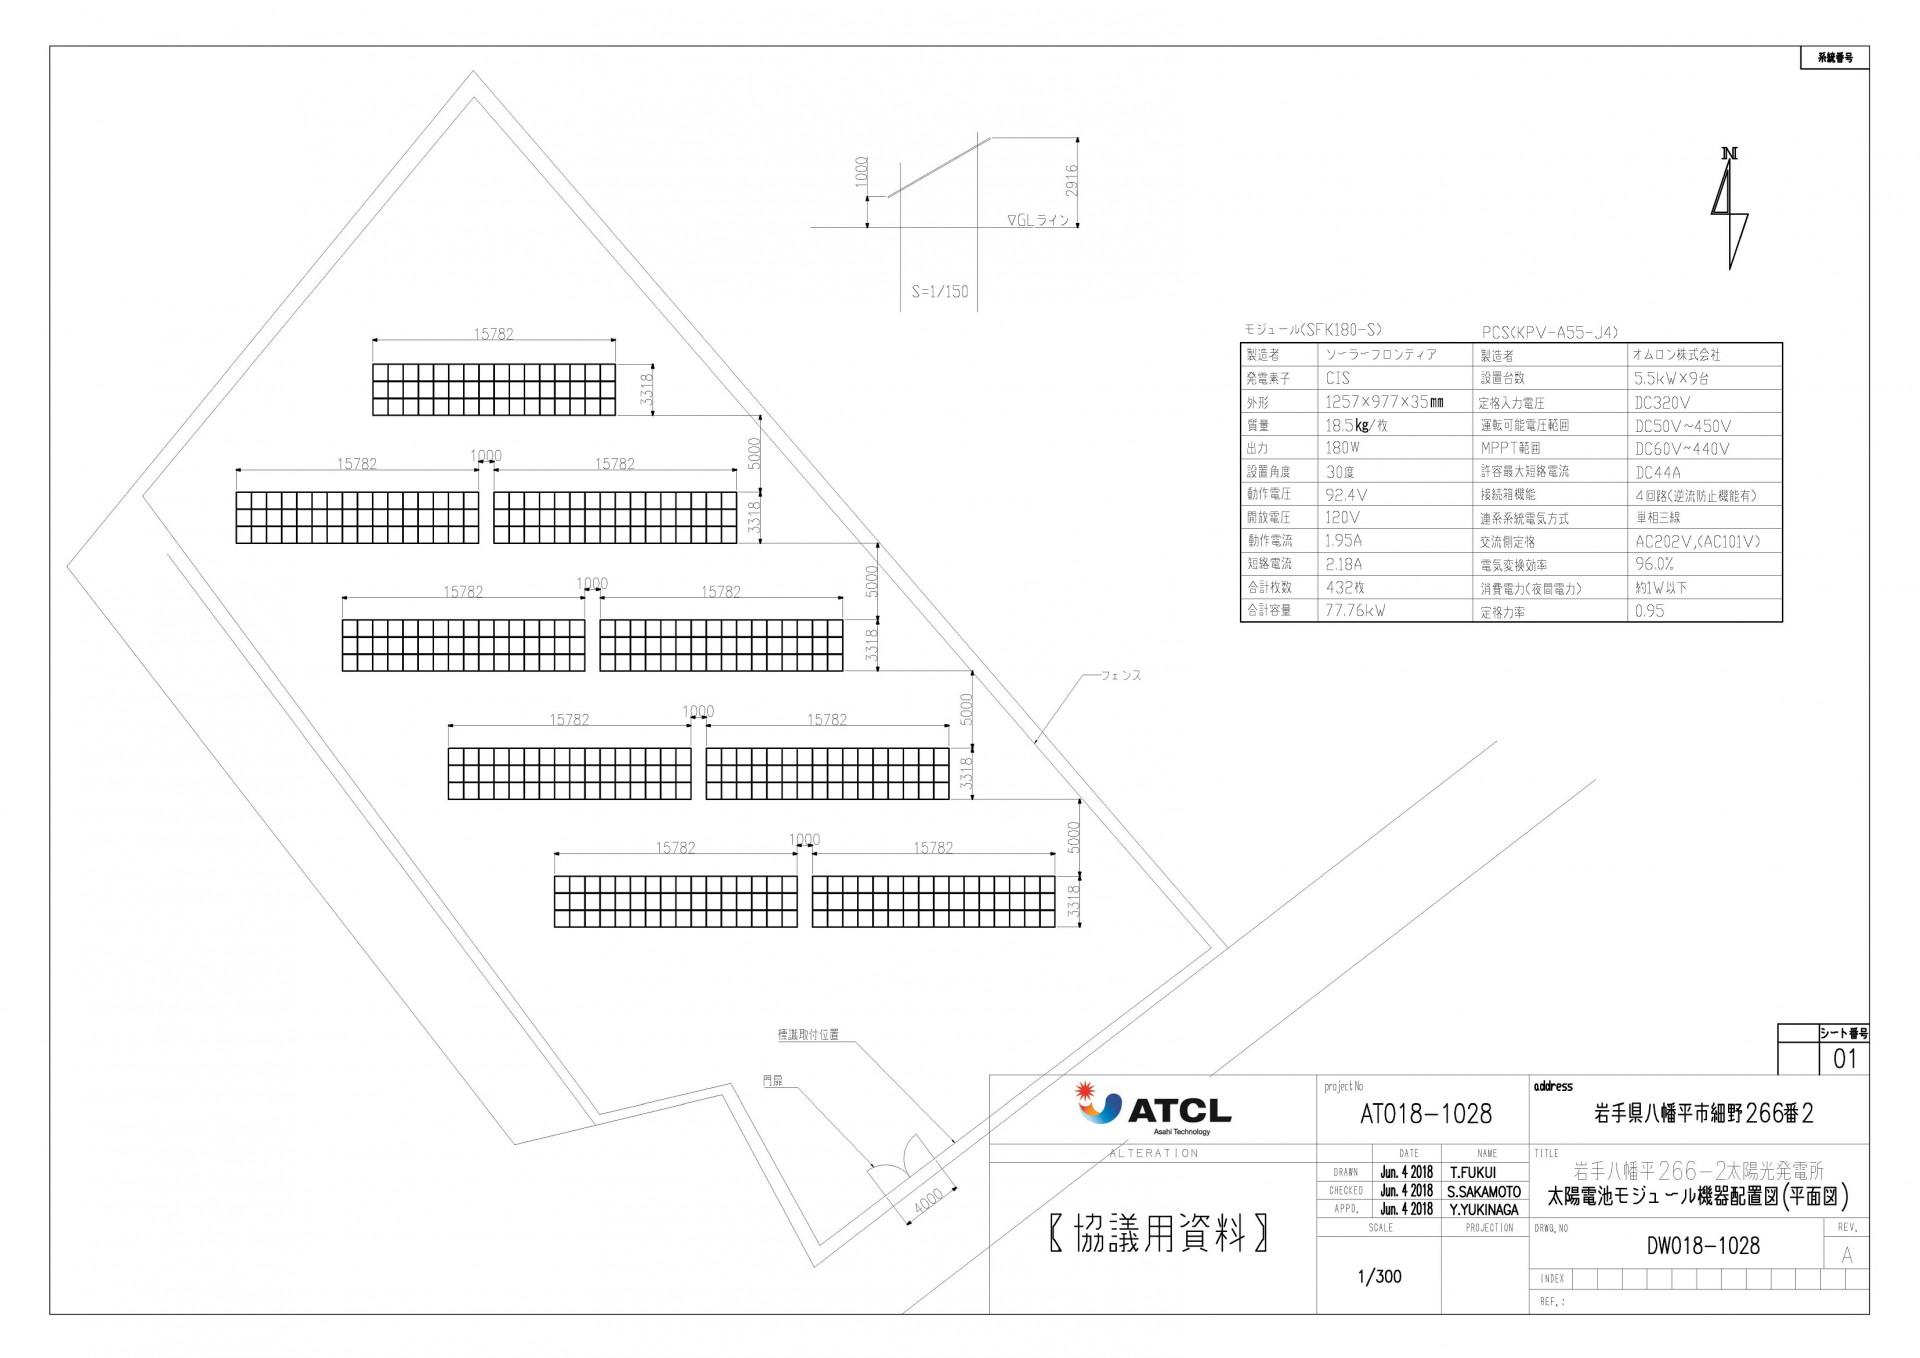 【APM】FIT18円 岩手県八幡平266-2発電所のメイン画像